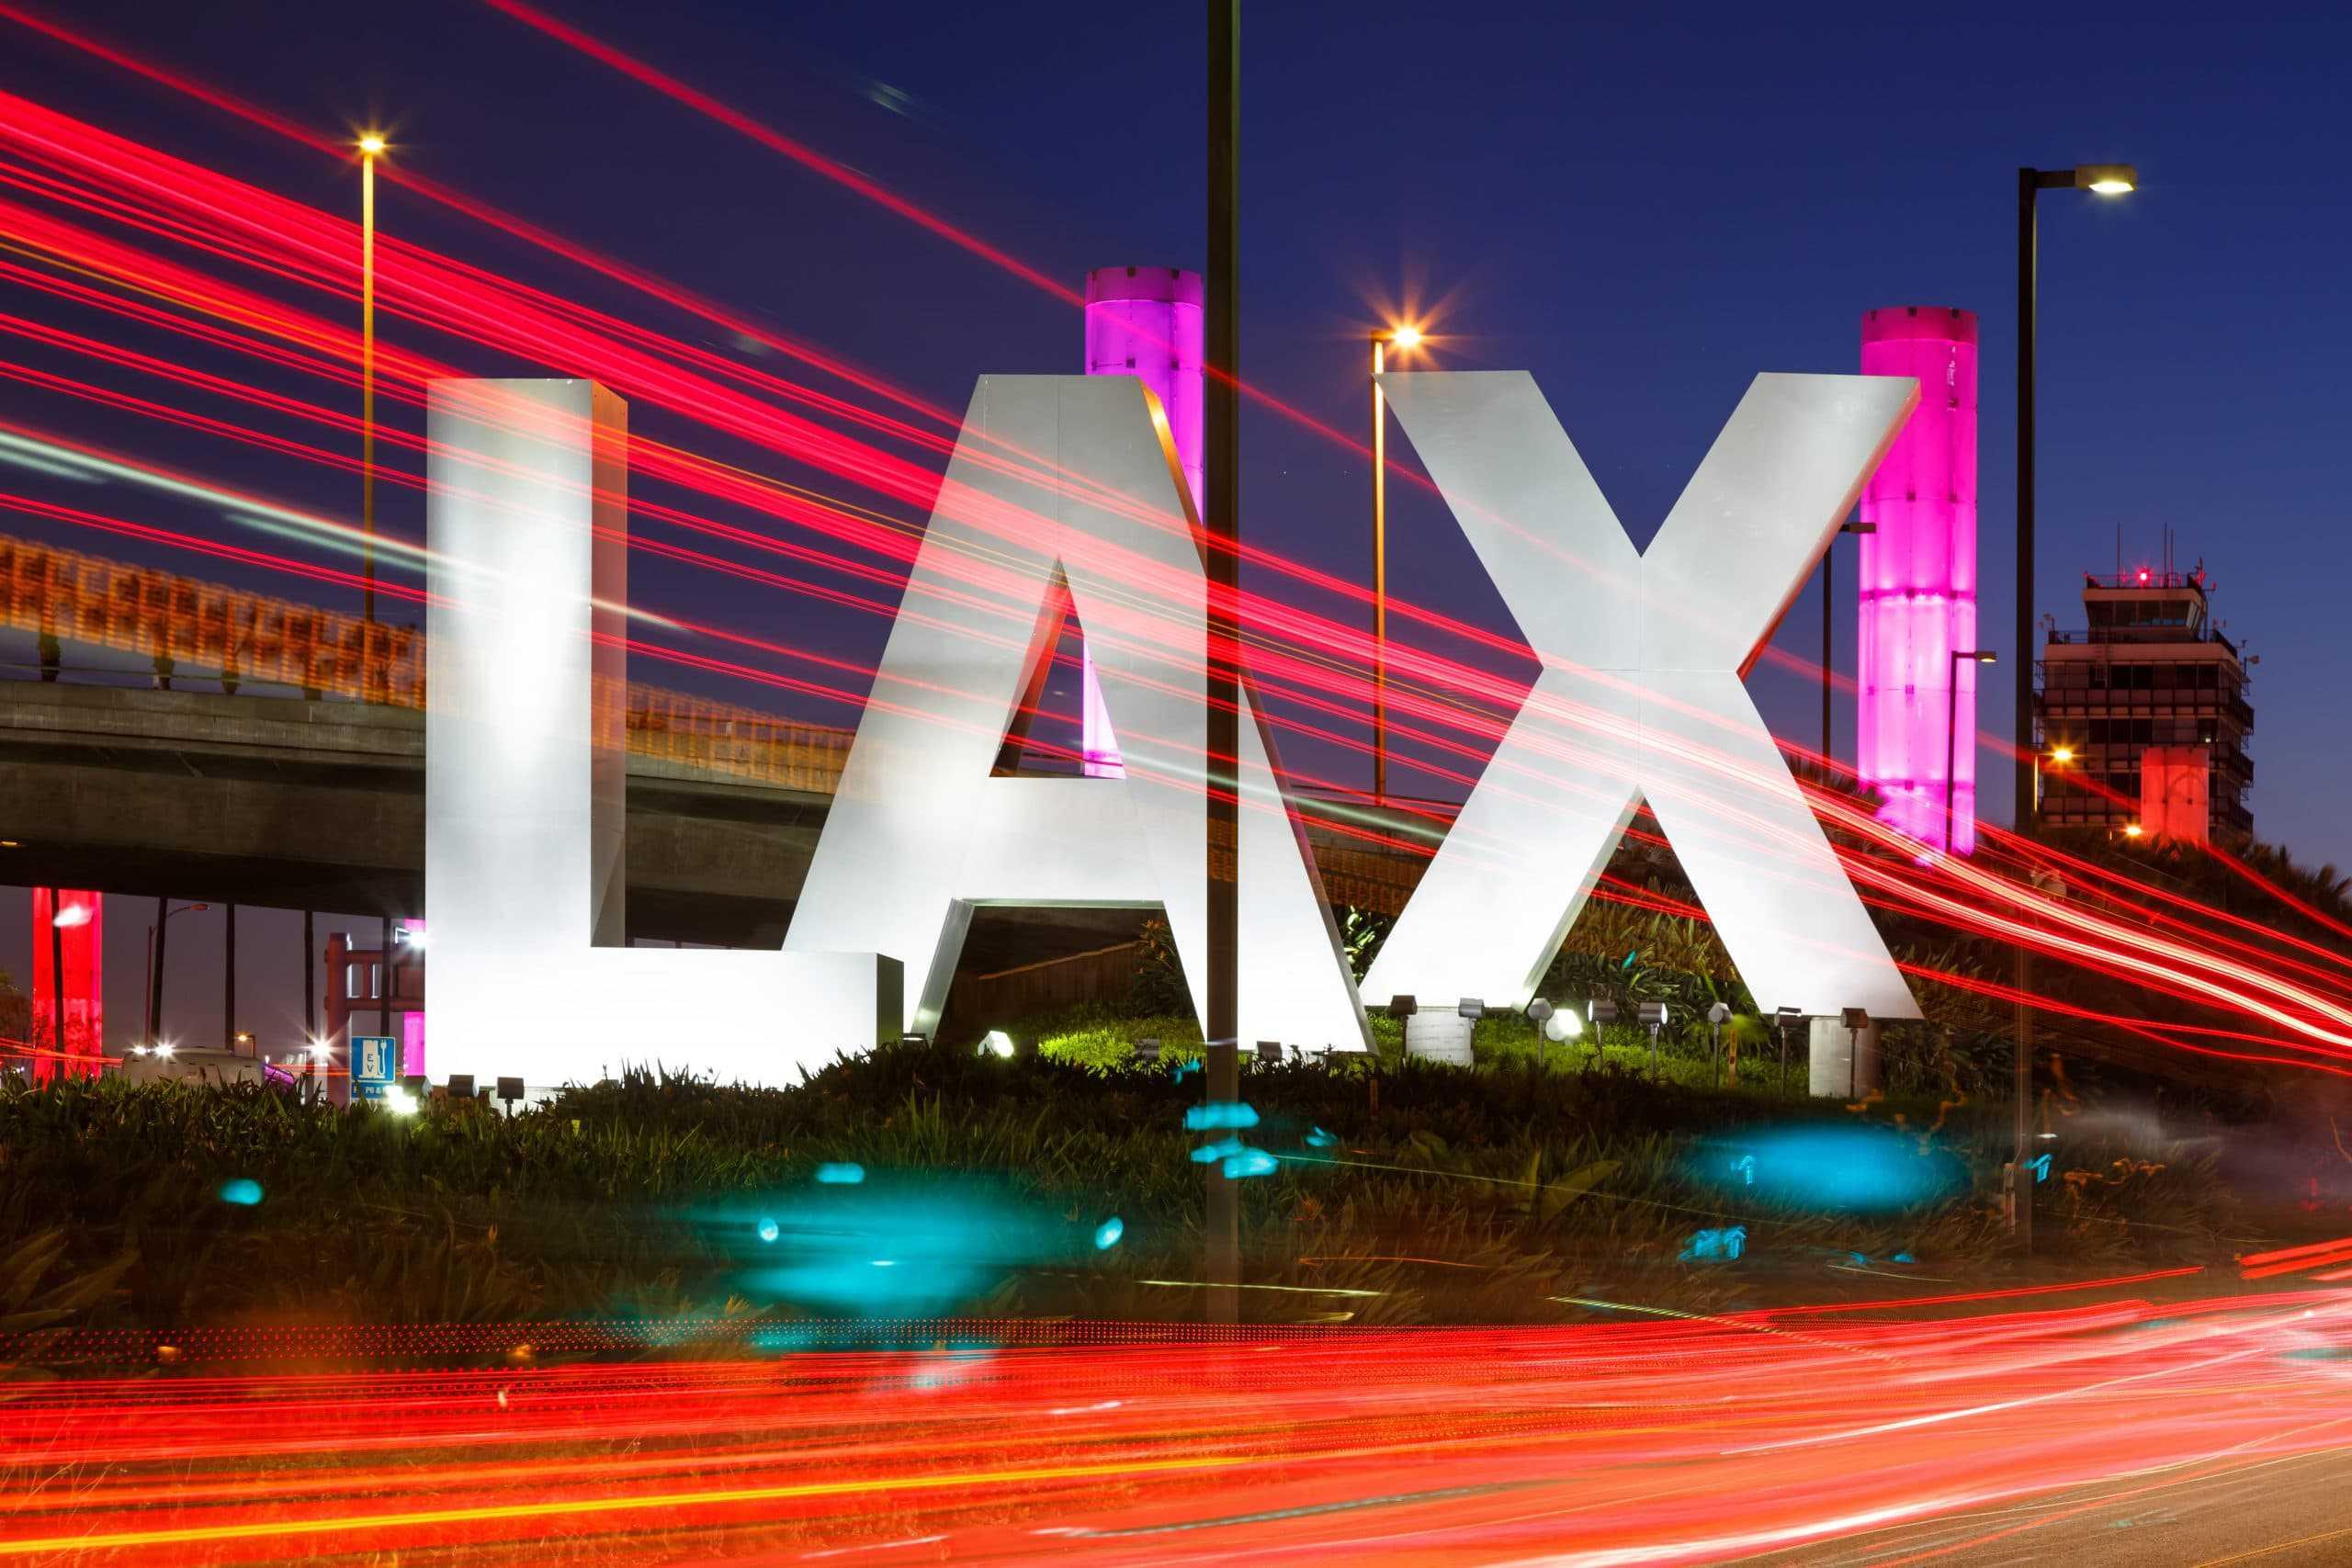 Flughafen Los Angeles International Airport LAX Logo sign